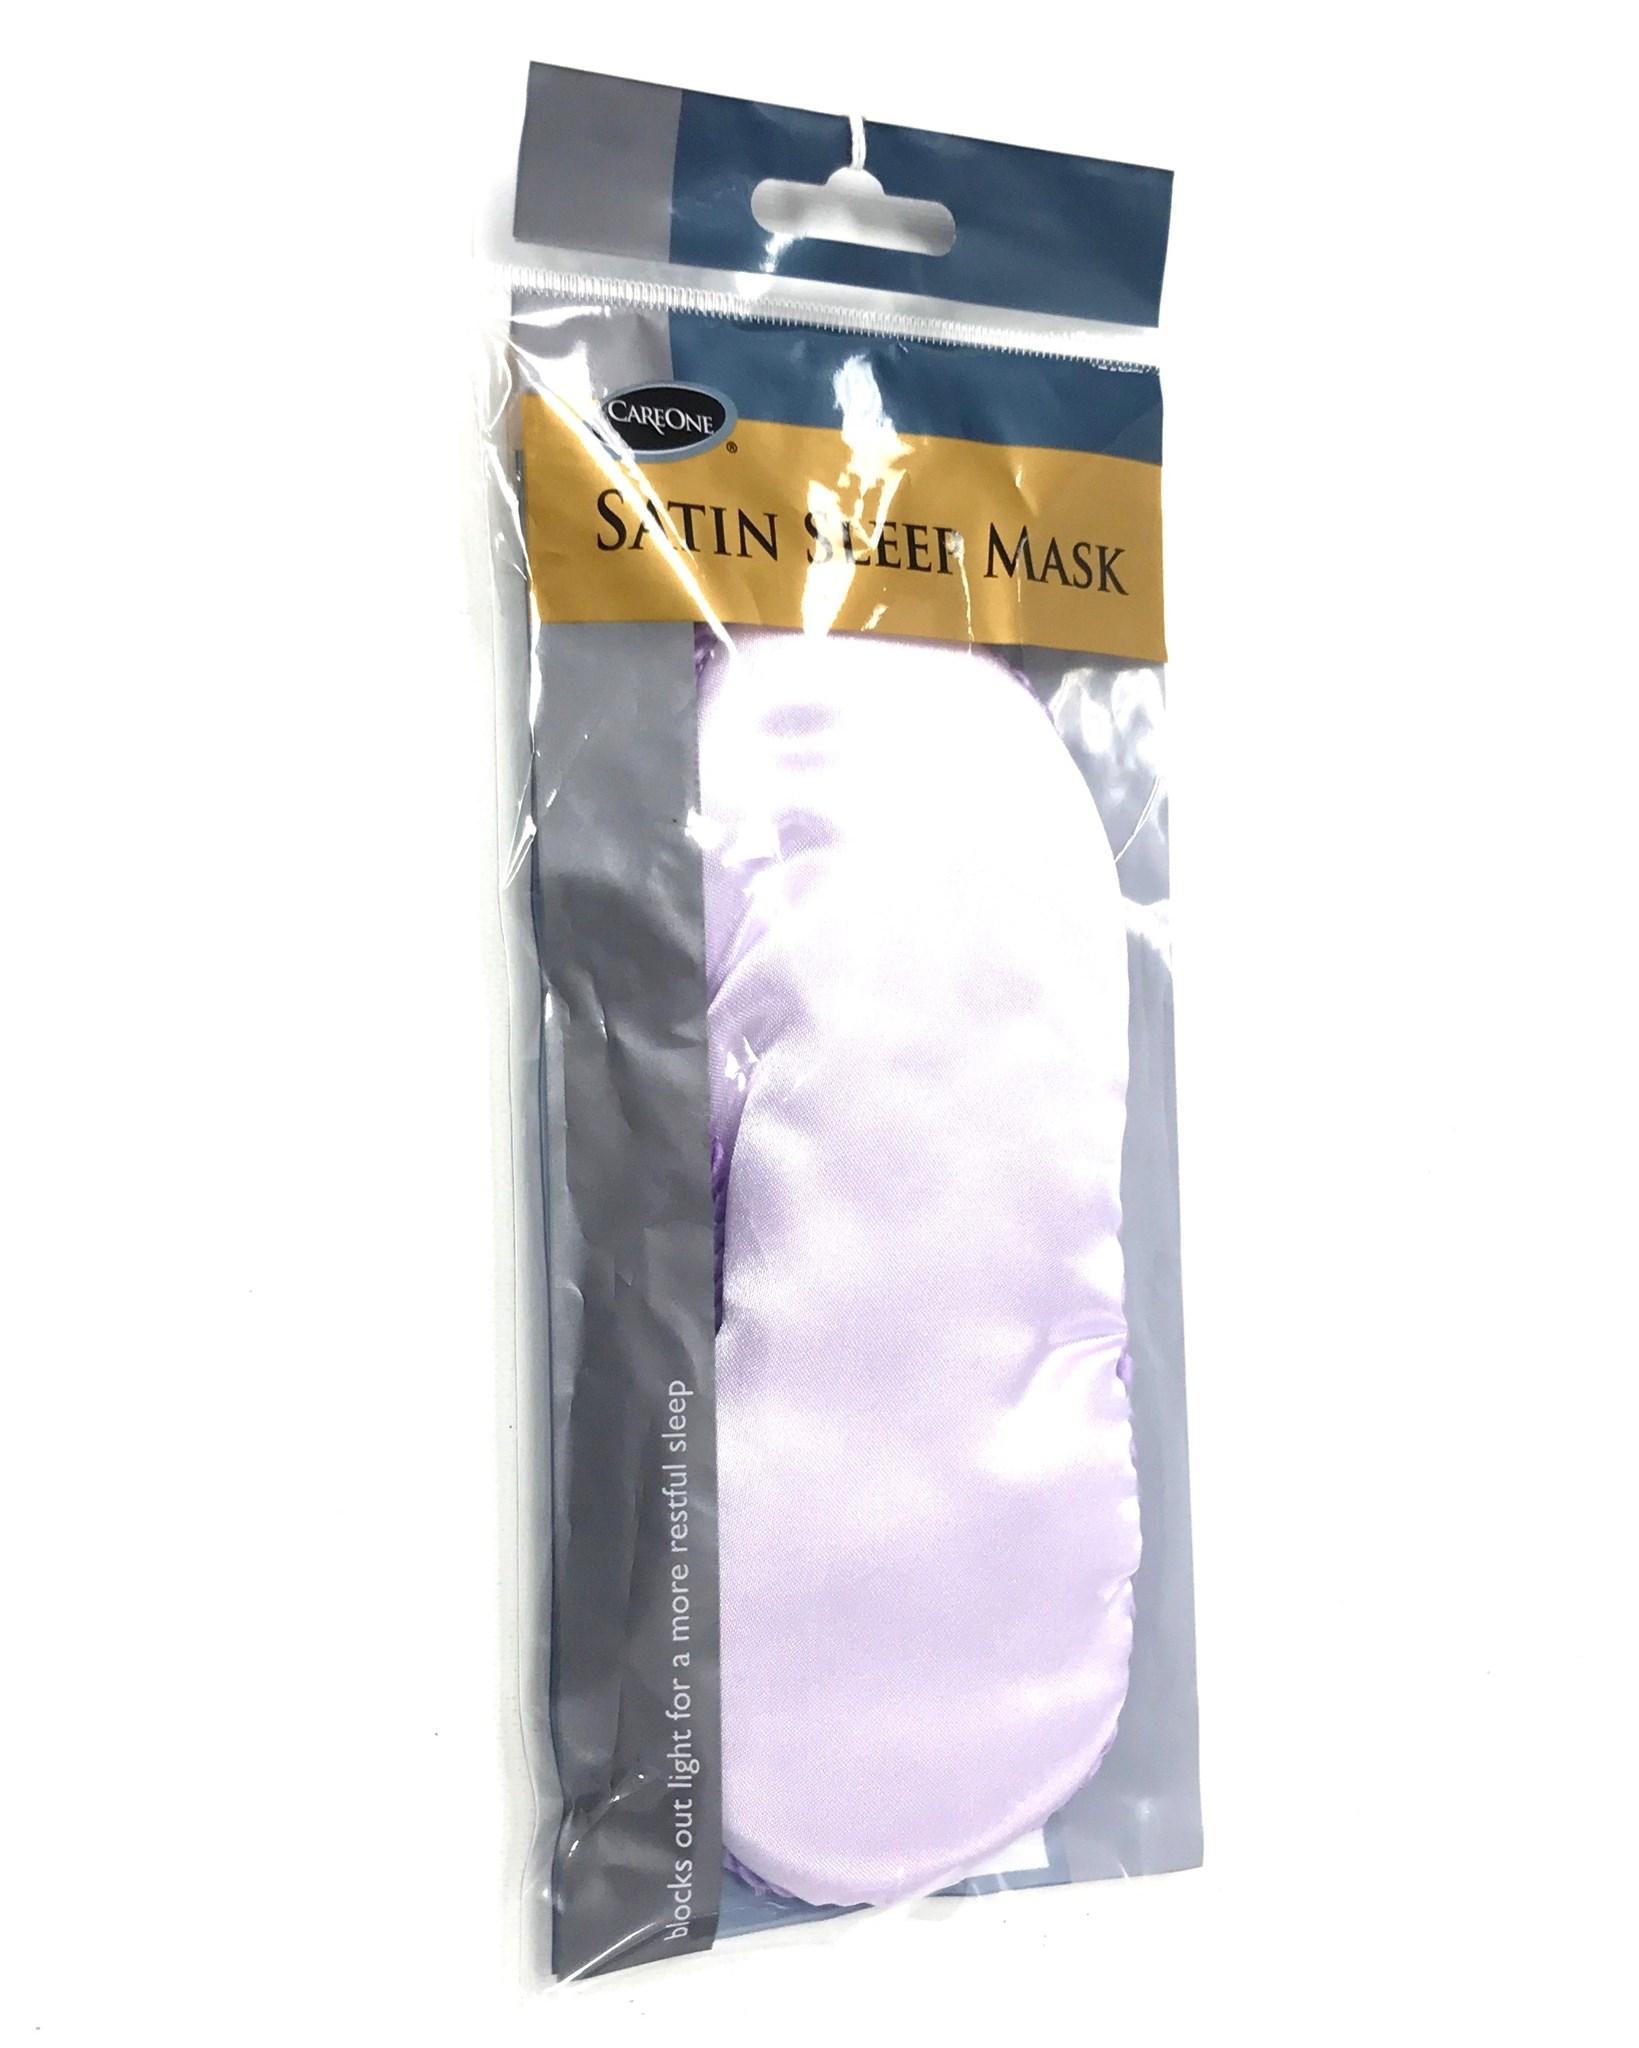 Silky Sleep Mask